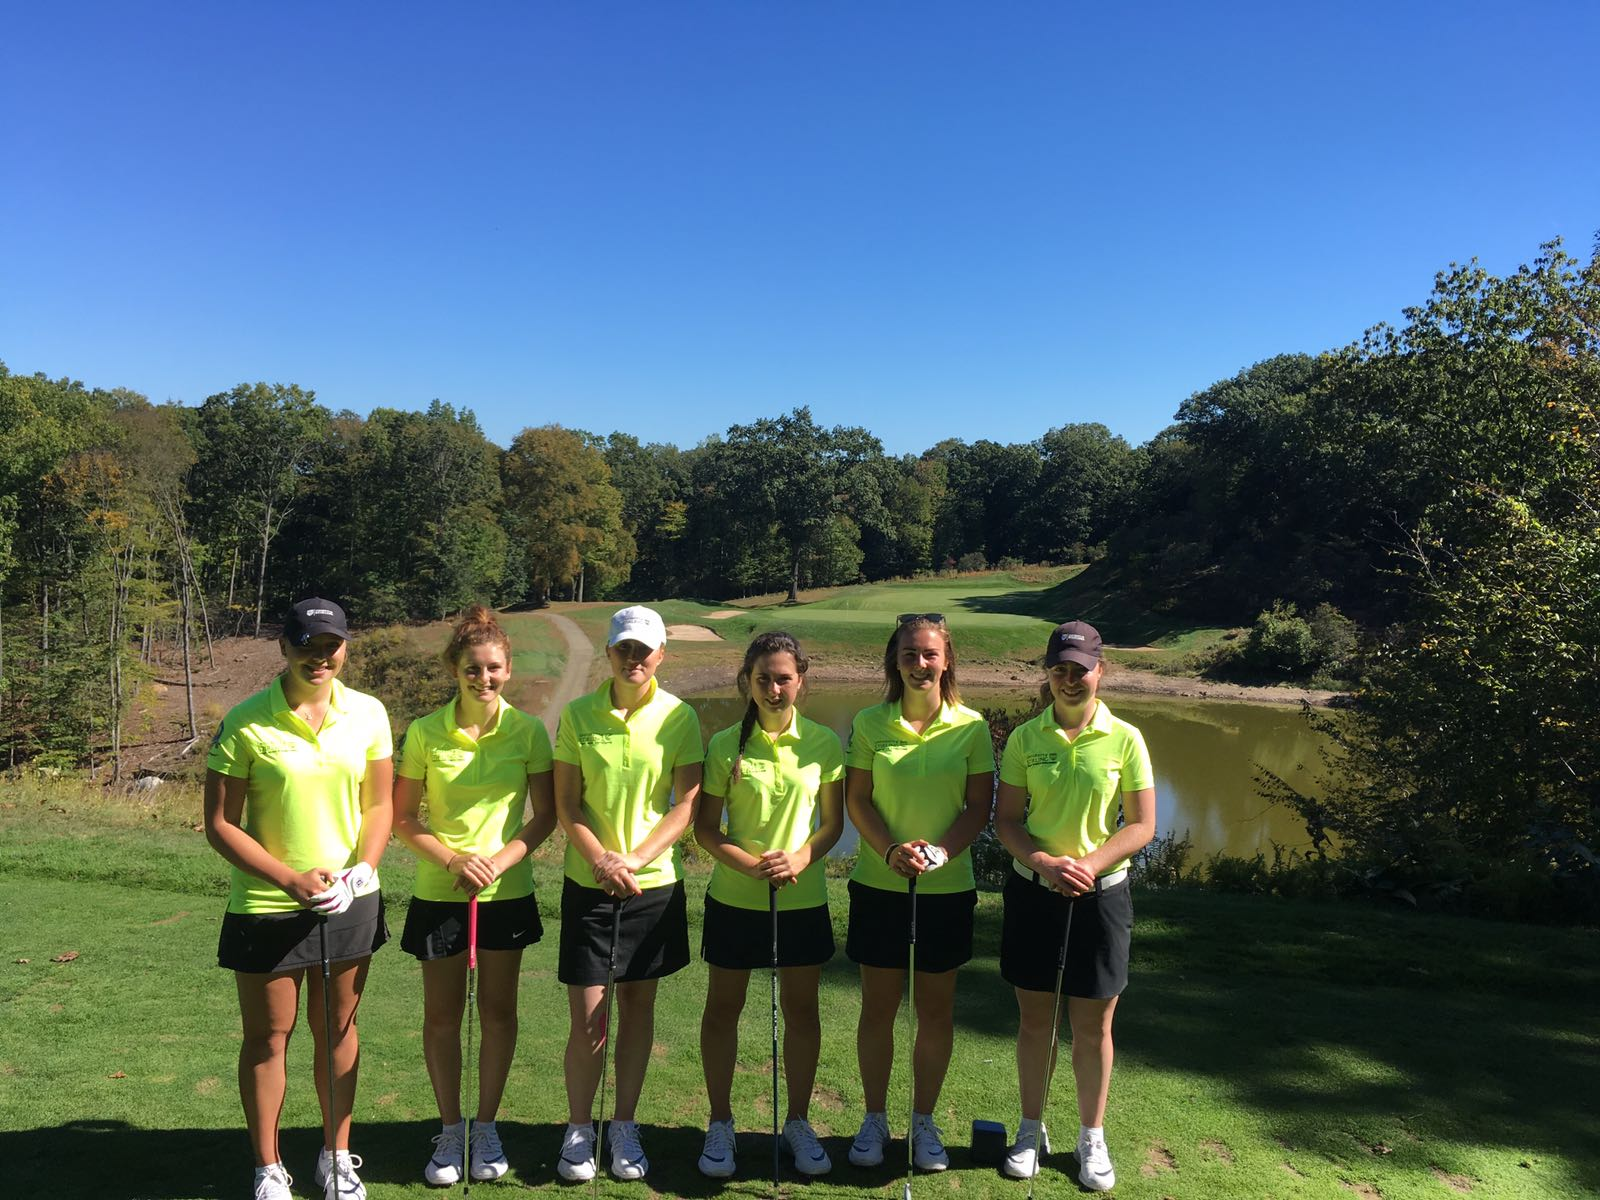 strling-womens-golf-at-yale